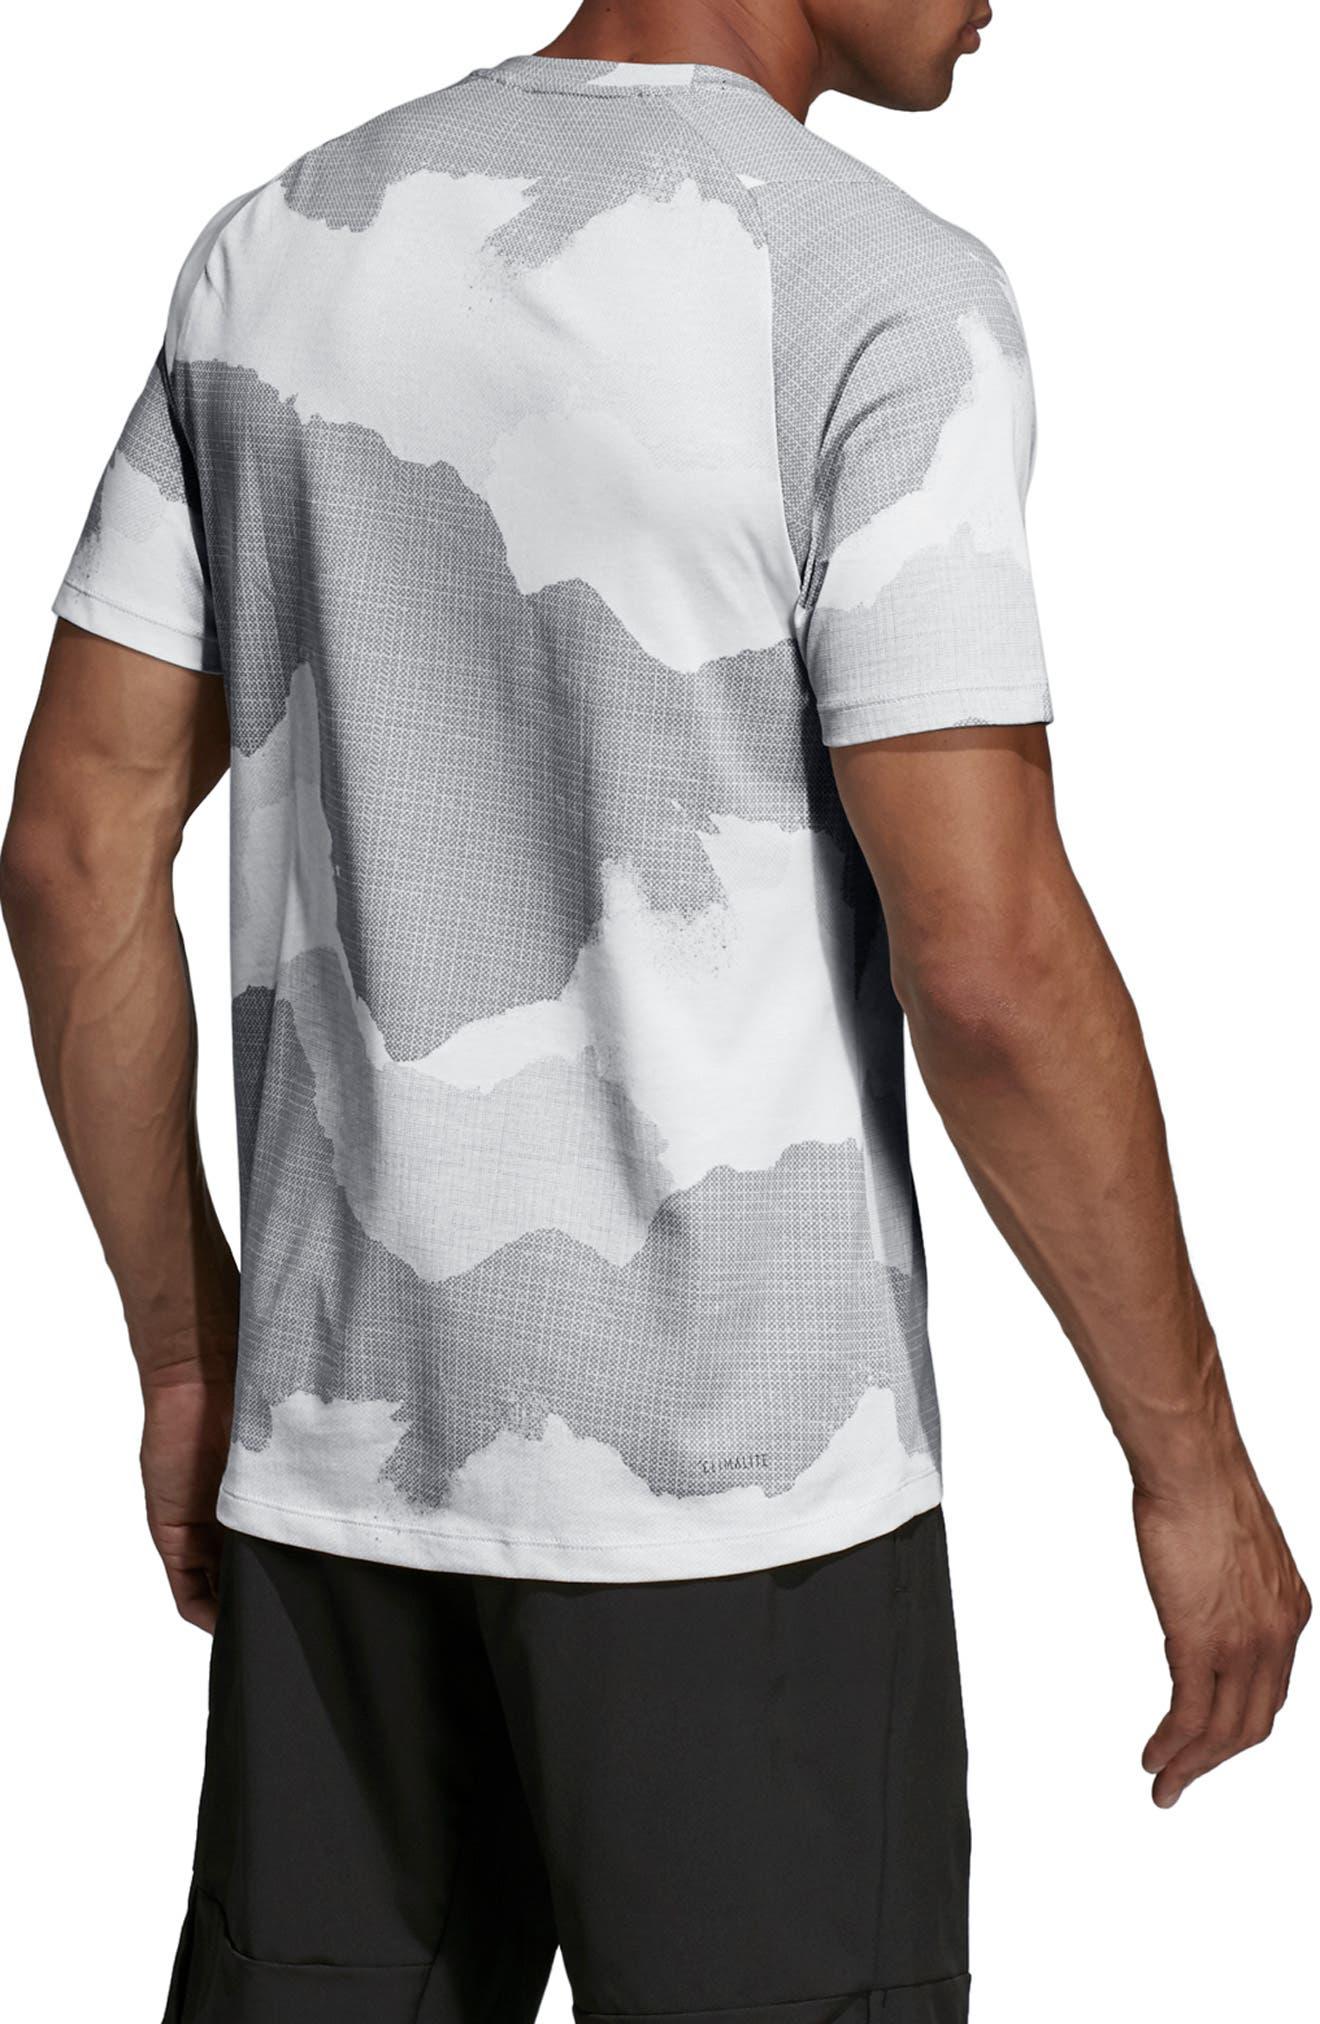 ADIDAS,                             Tech Camo T-Shirt,                             Alternate thumbnail 2, color,                             RAW WHITE/ GREY